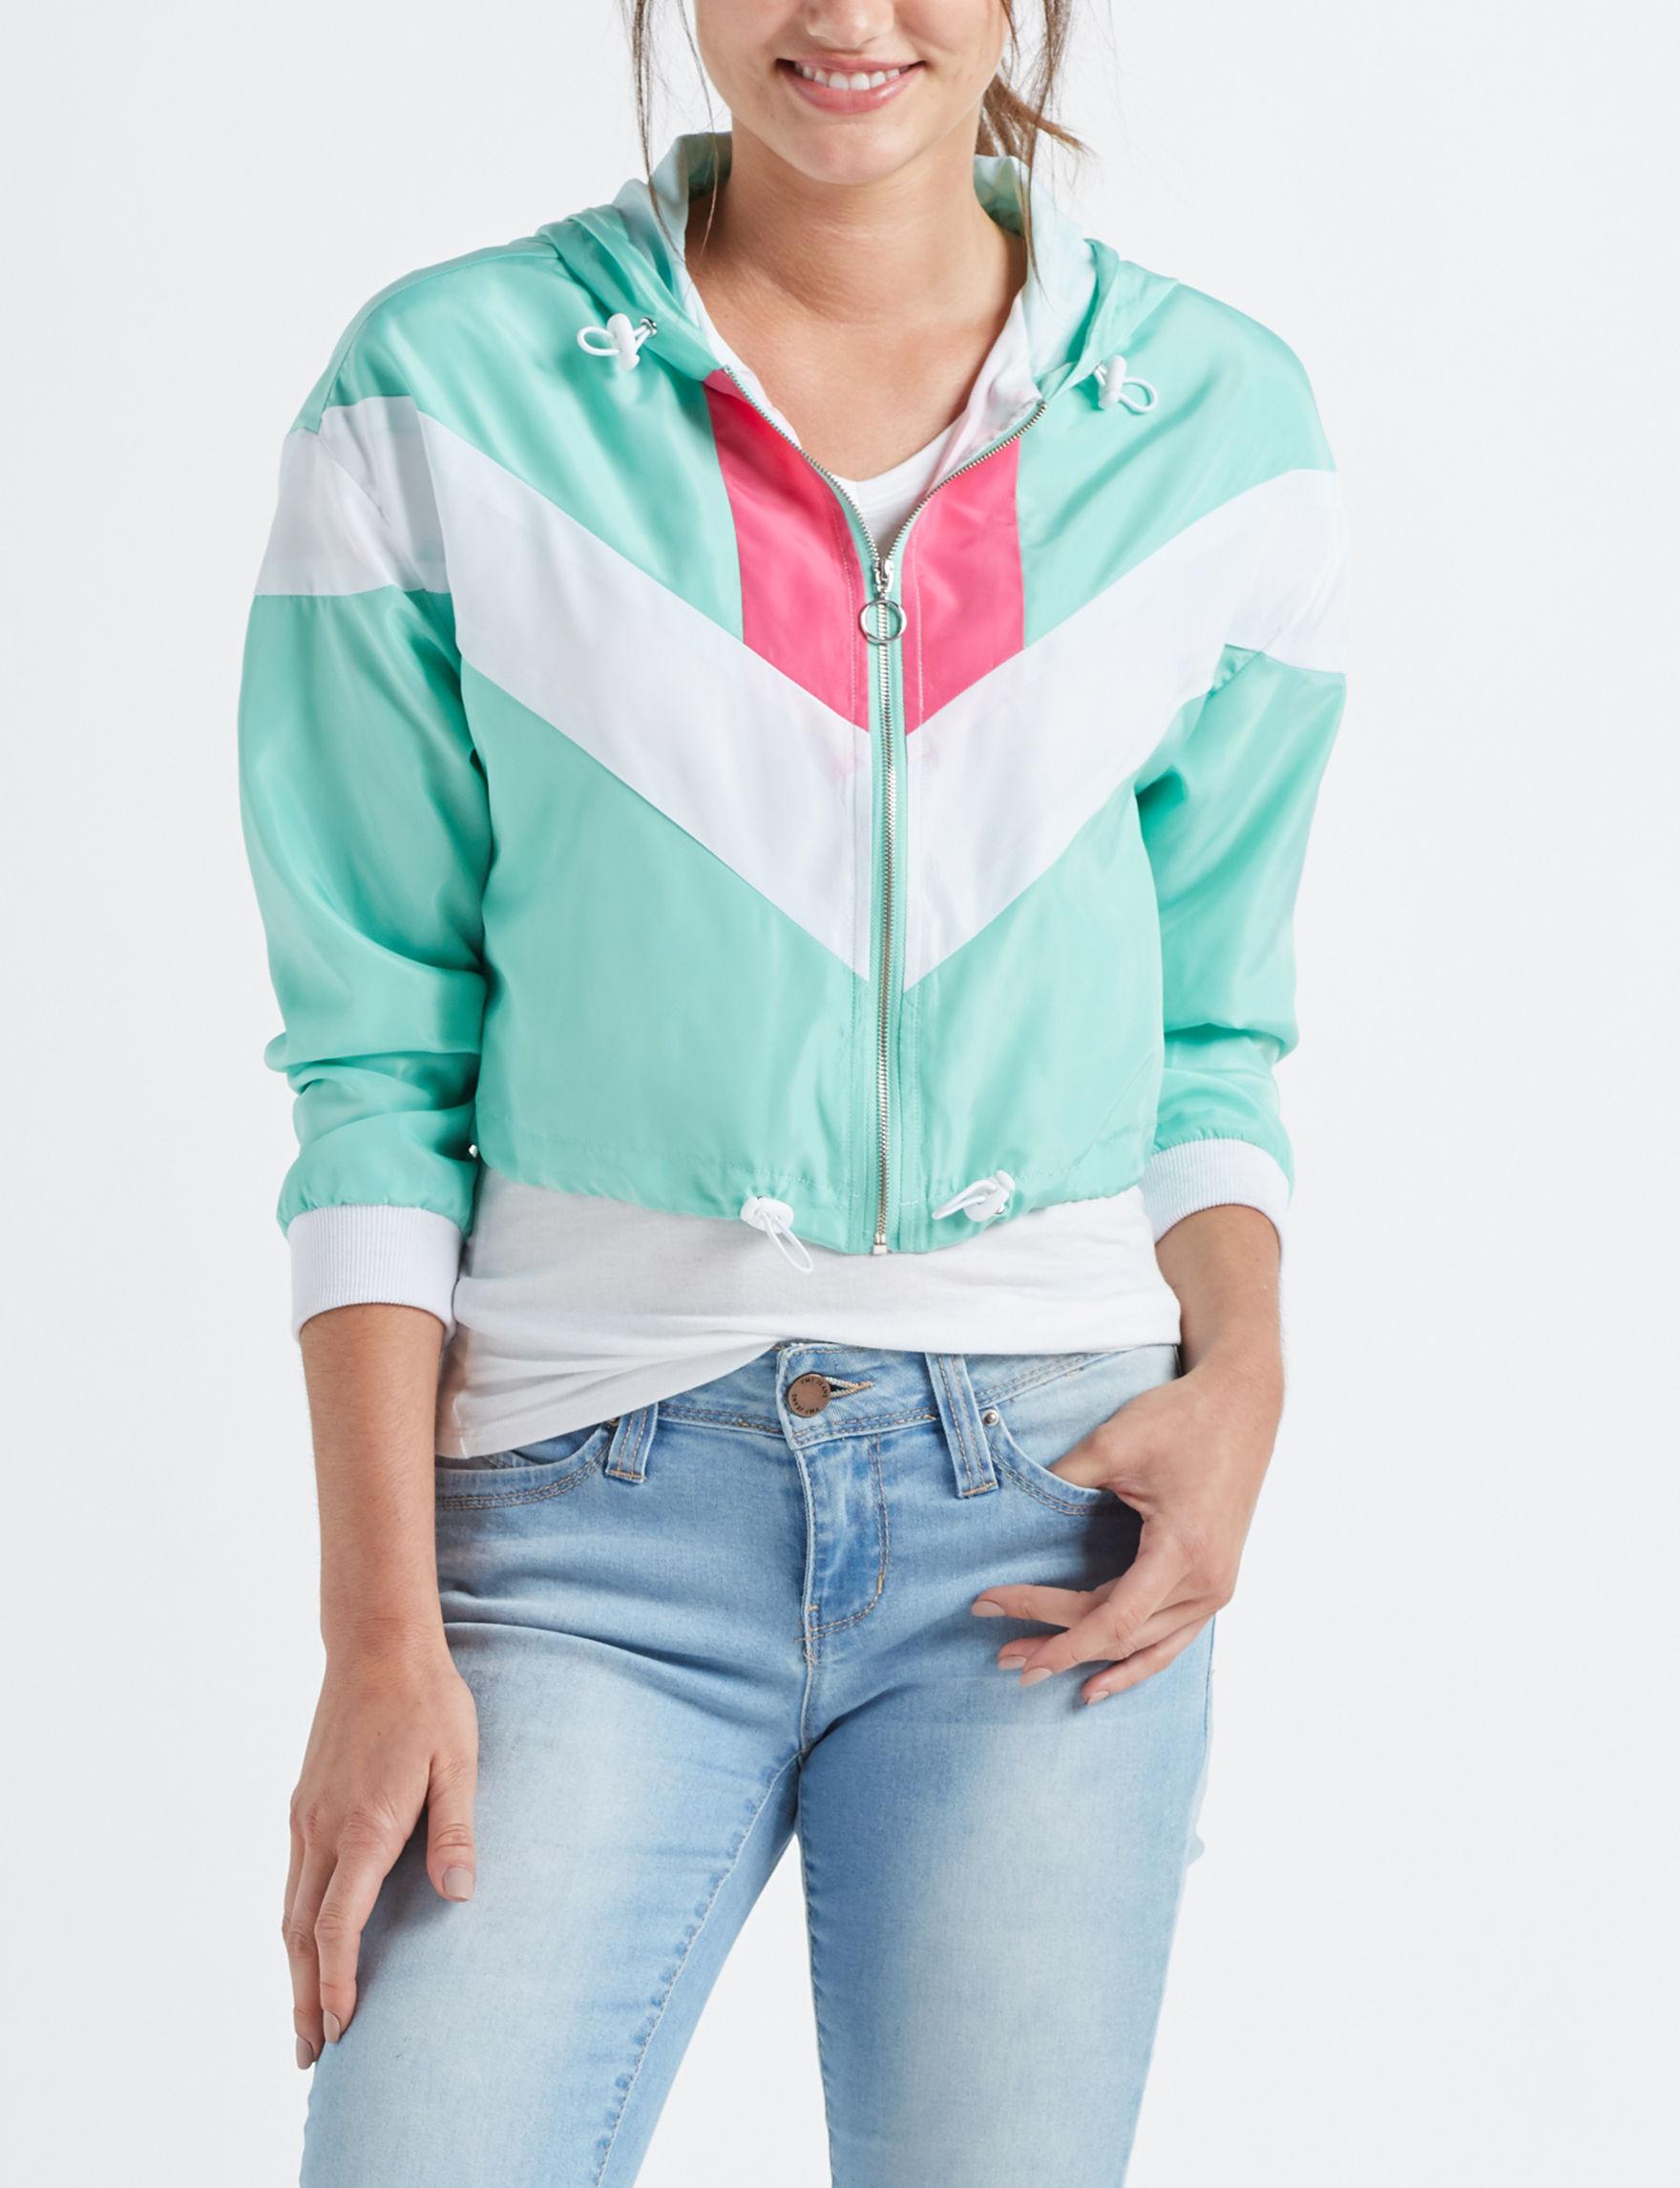 Justify Teal / Pink Lightweight Jackets & Blazers